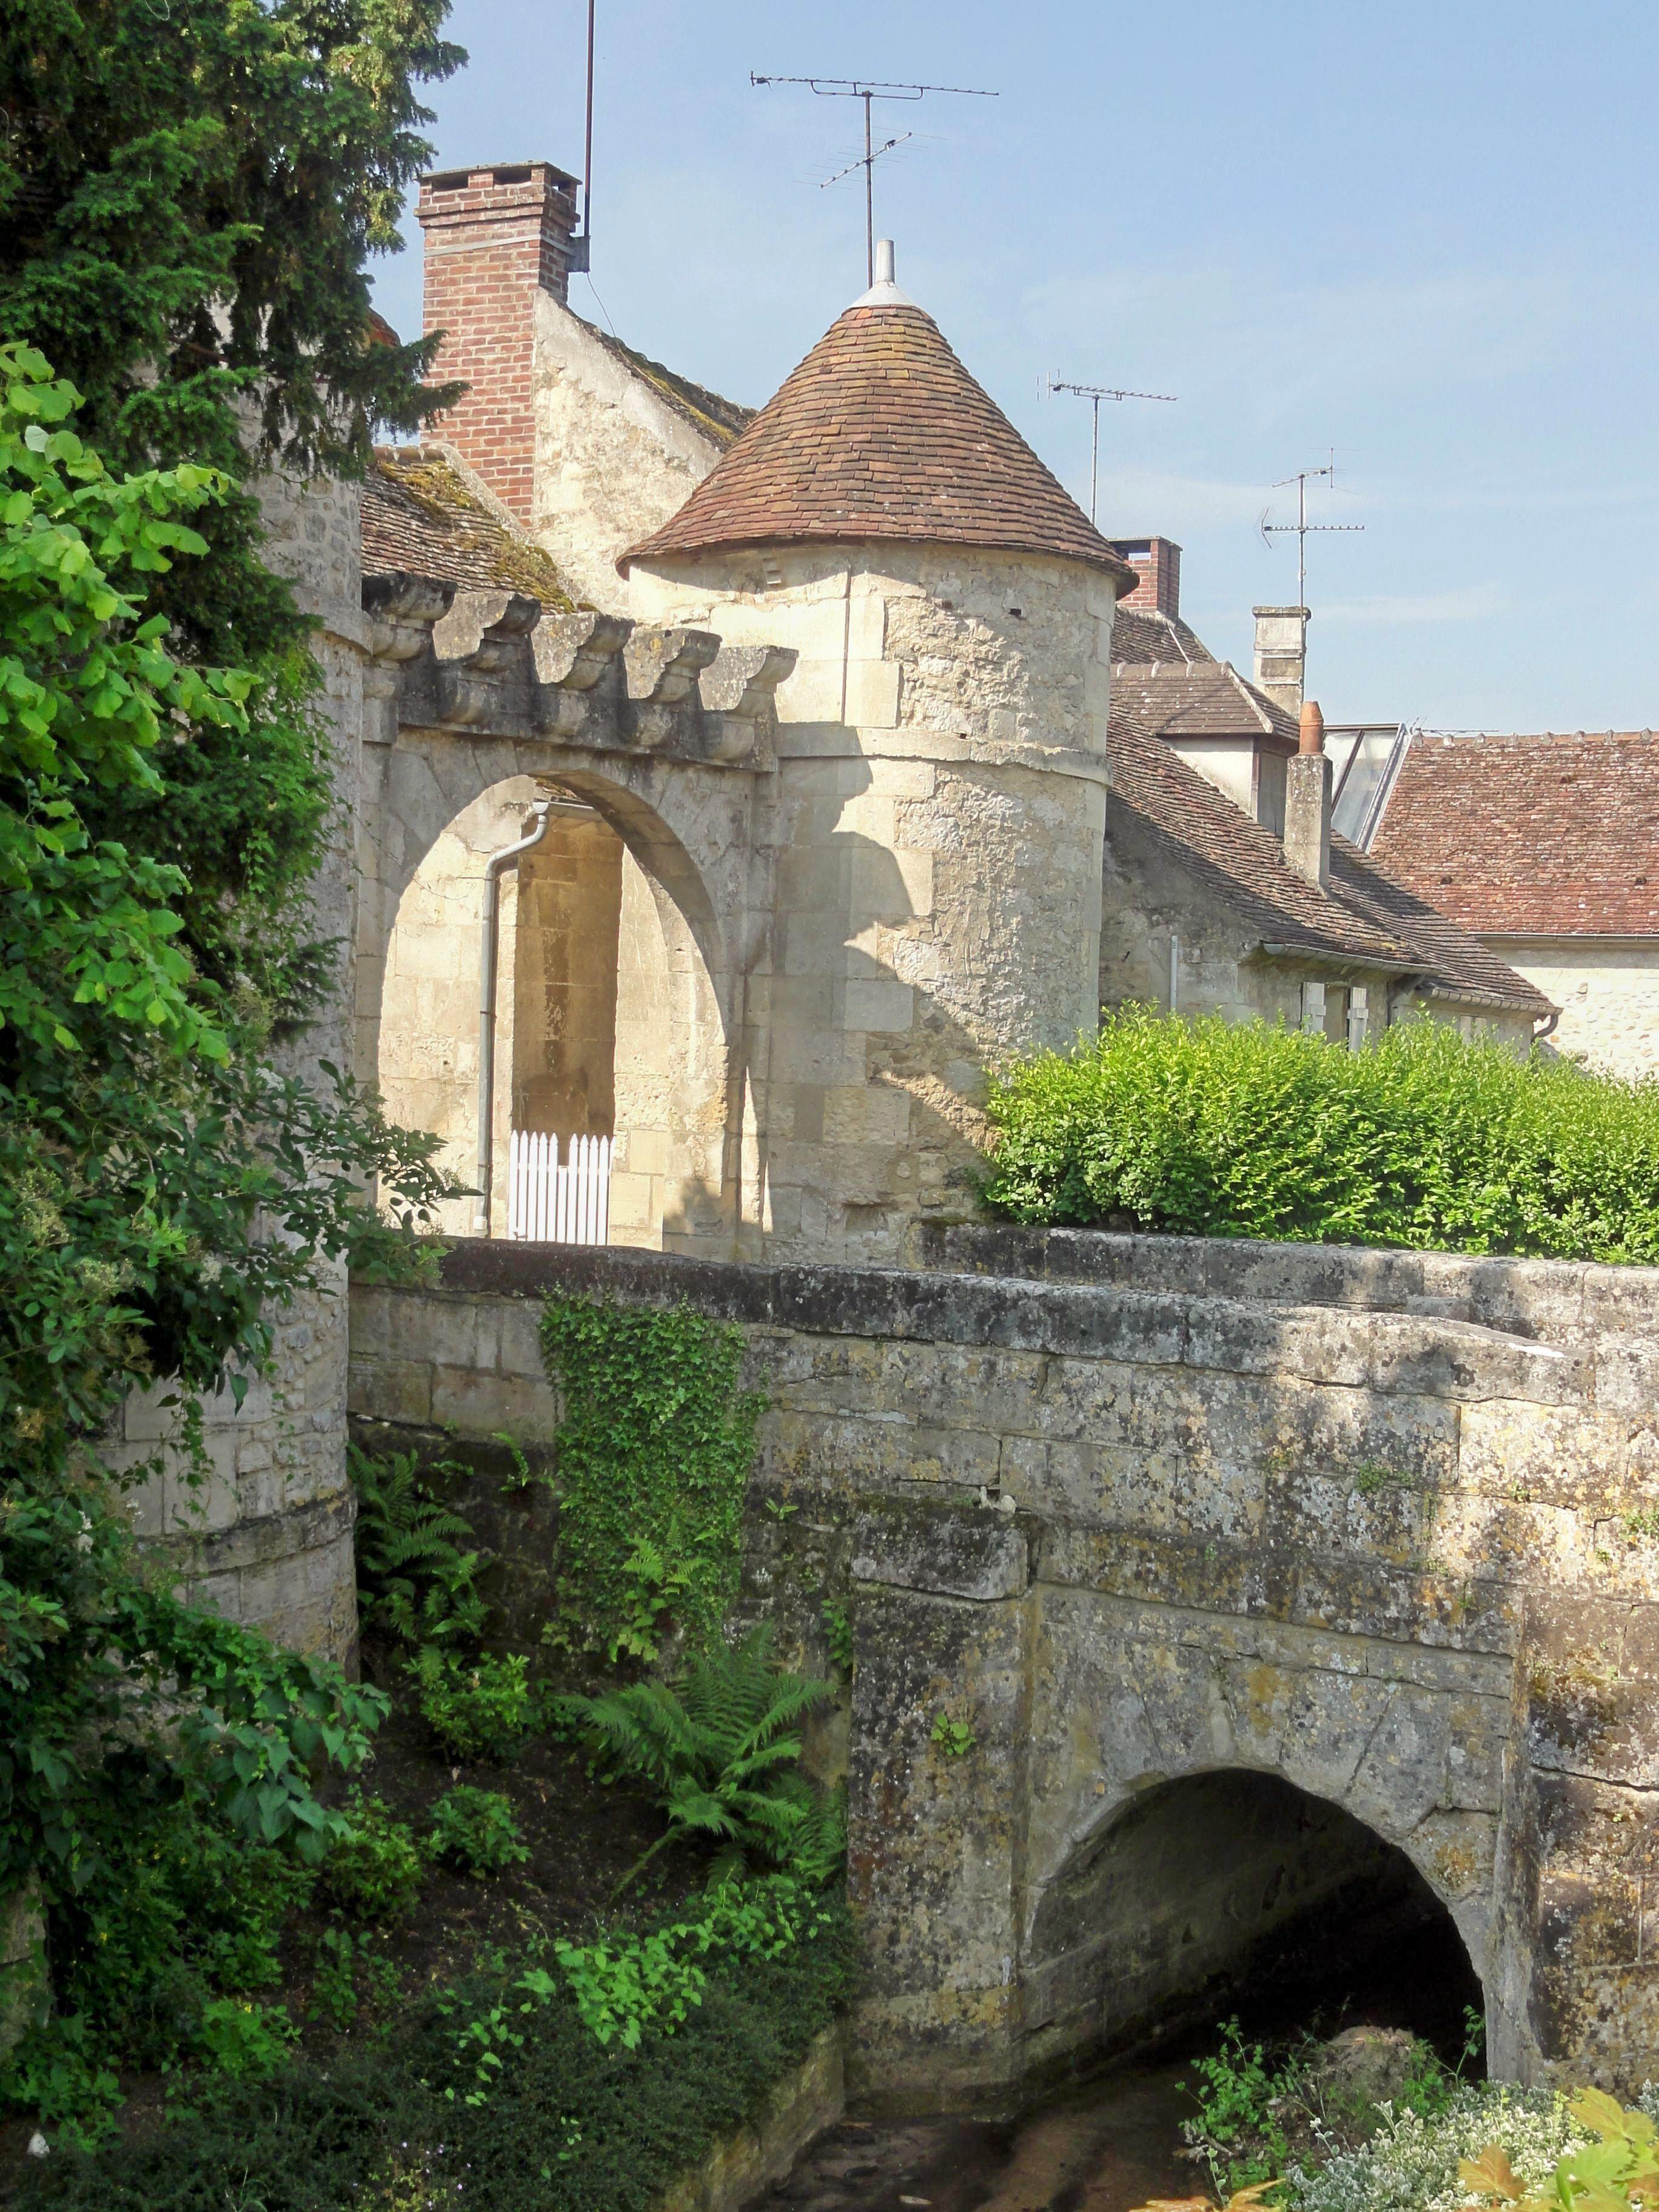 Saint Jean Au Bois - File Saint Jean aux Bois (60), porte fortifiée de l'abbaye 2 jpg Wikimedia Commons